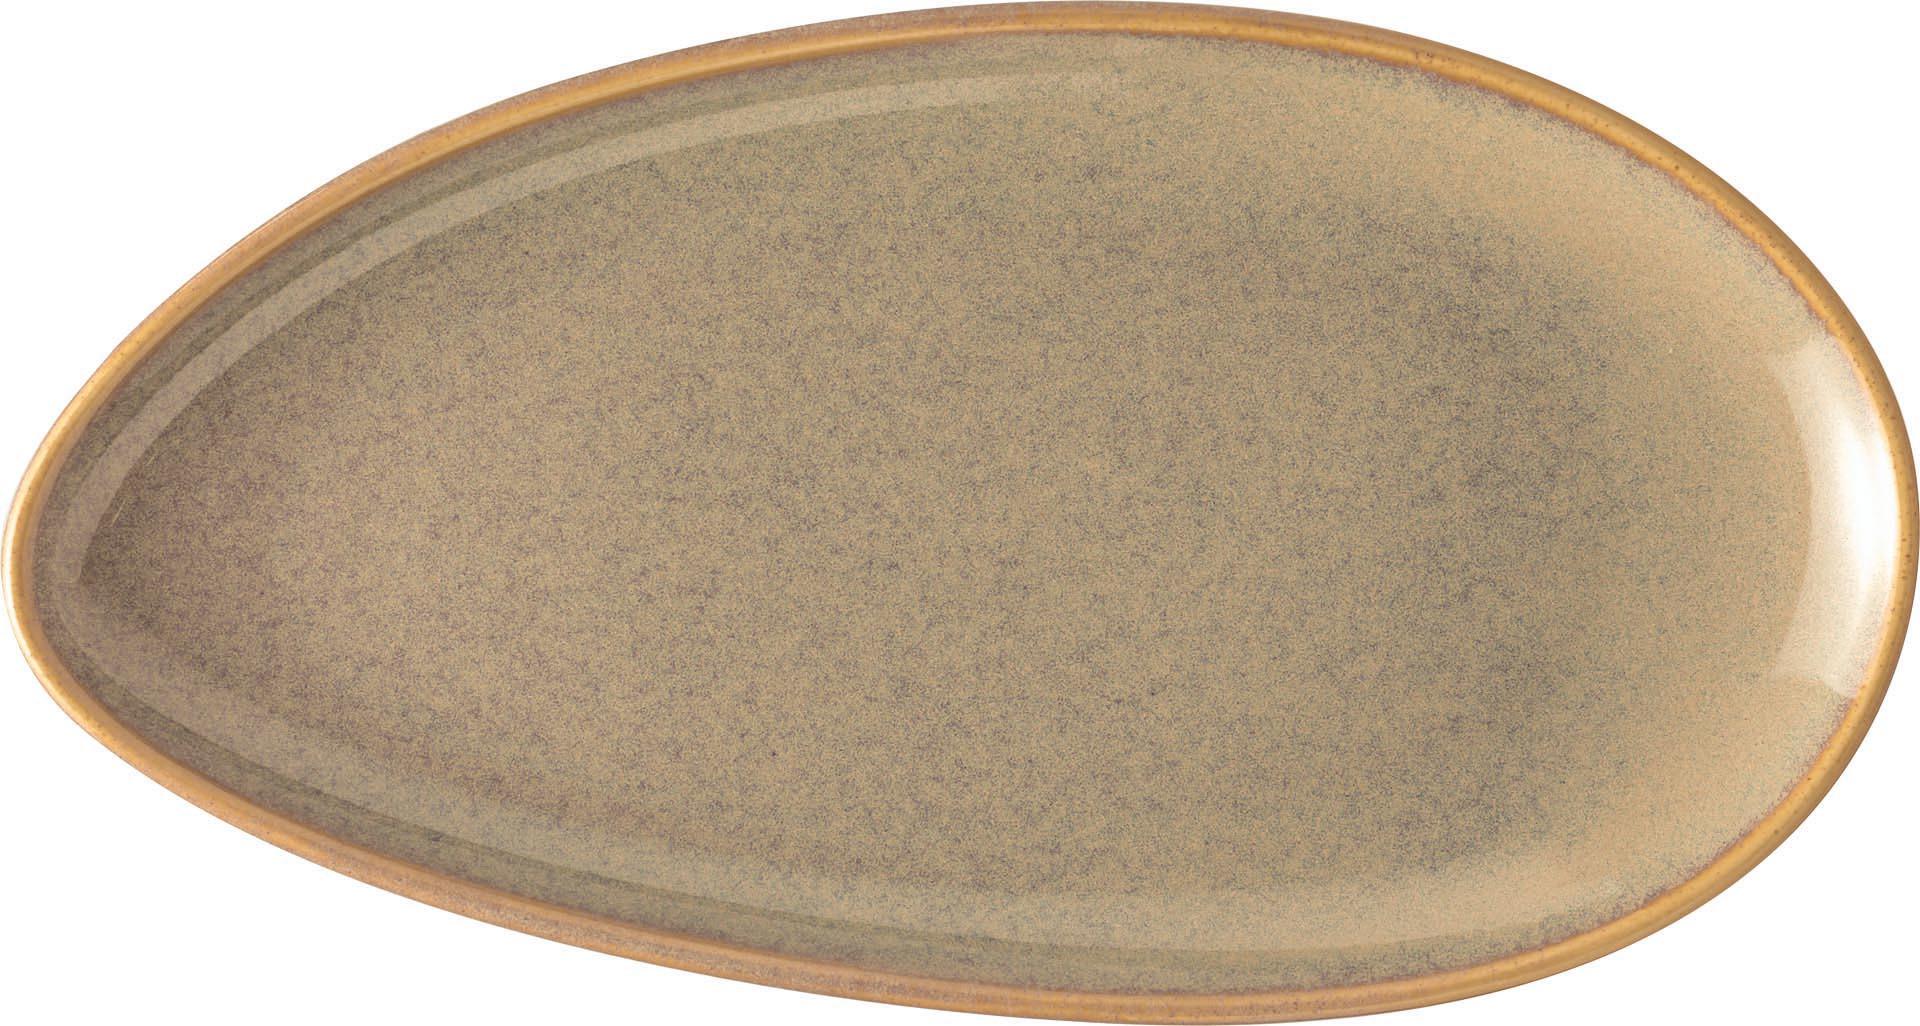 "Platte flach oval ""Vida"" 25,5 cm"